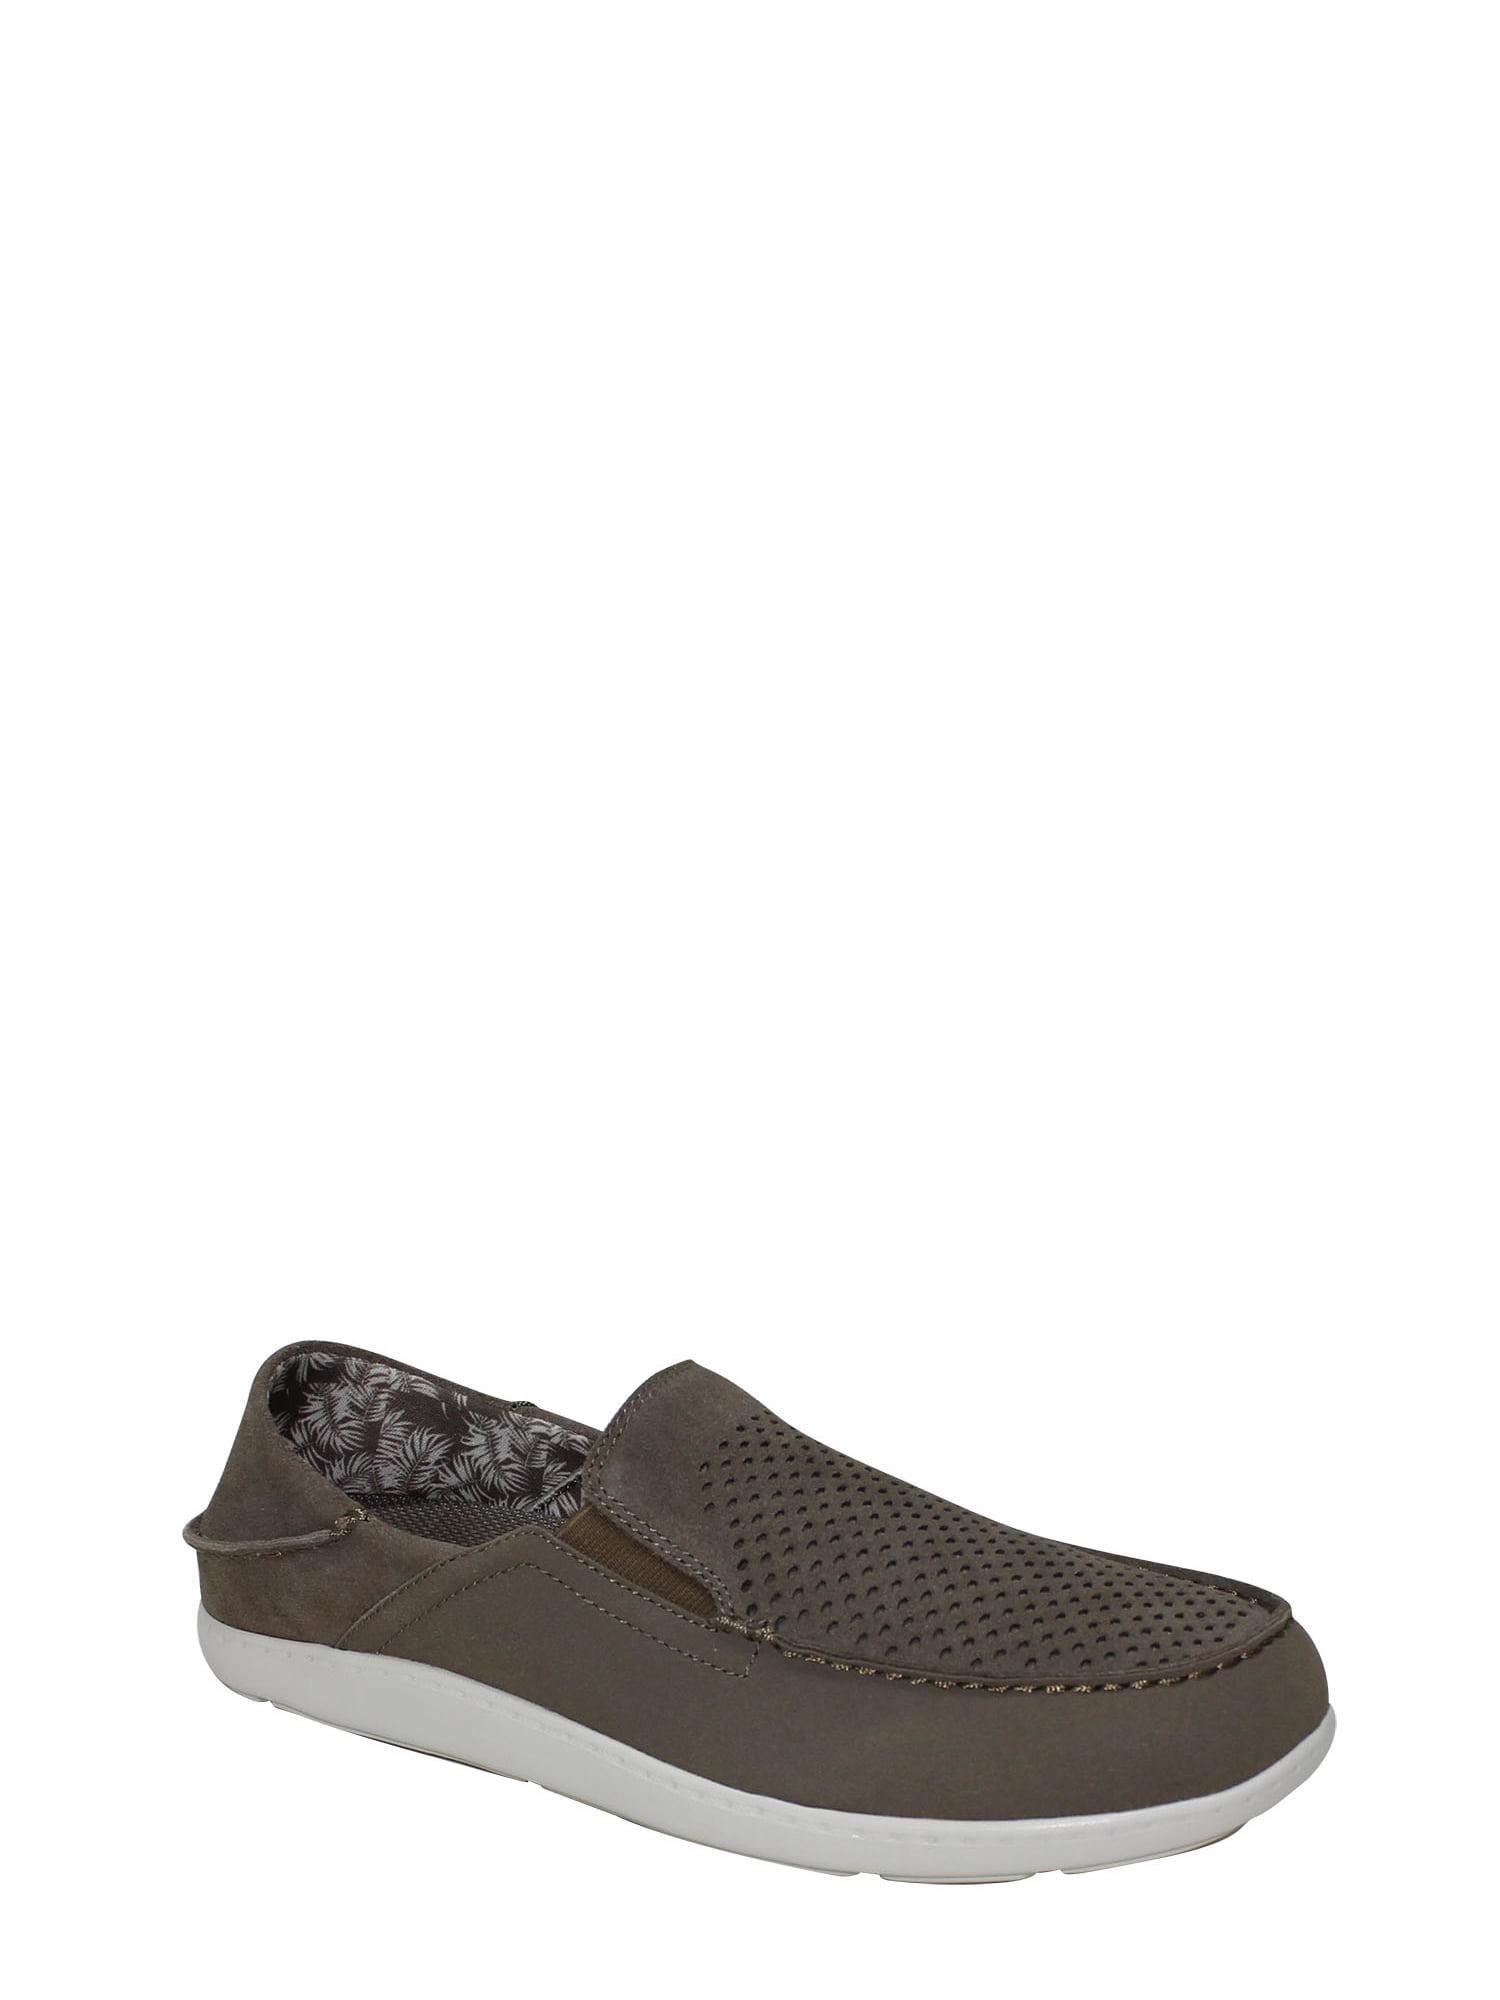 Casual Suede Slip-On Sneaker